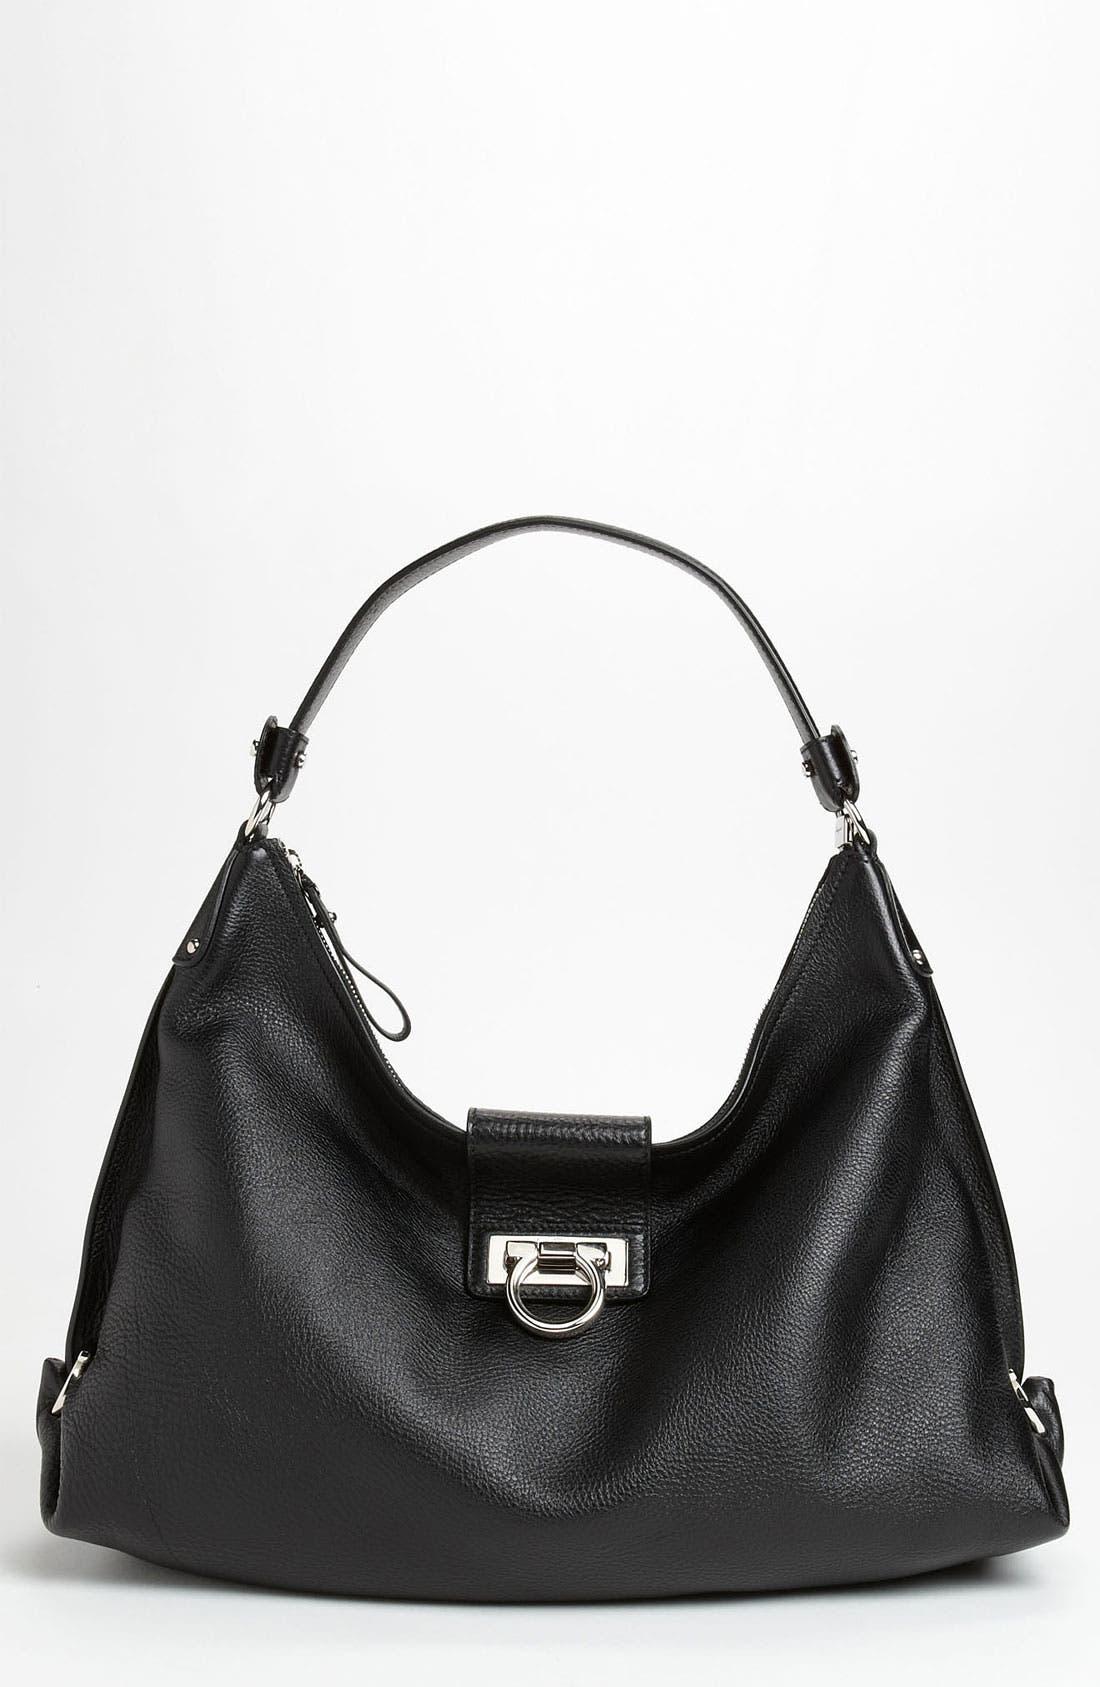 Main Image - Salvatore Ferragamo 'New Fanisa' Leather Hobo